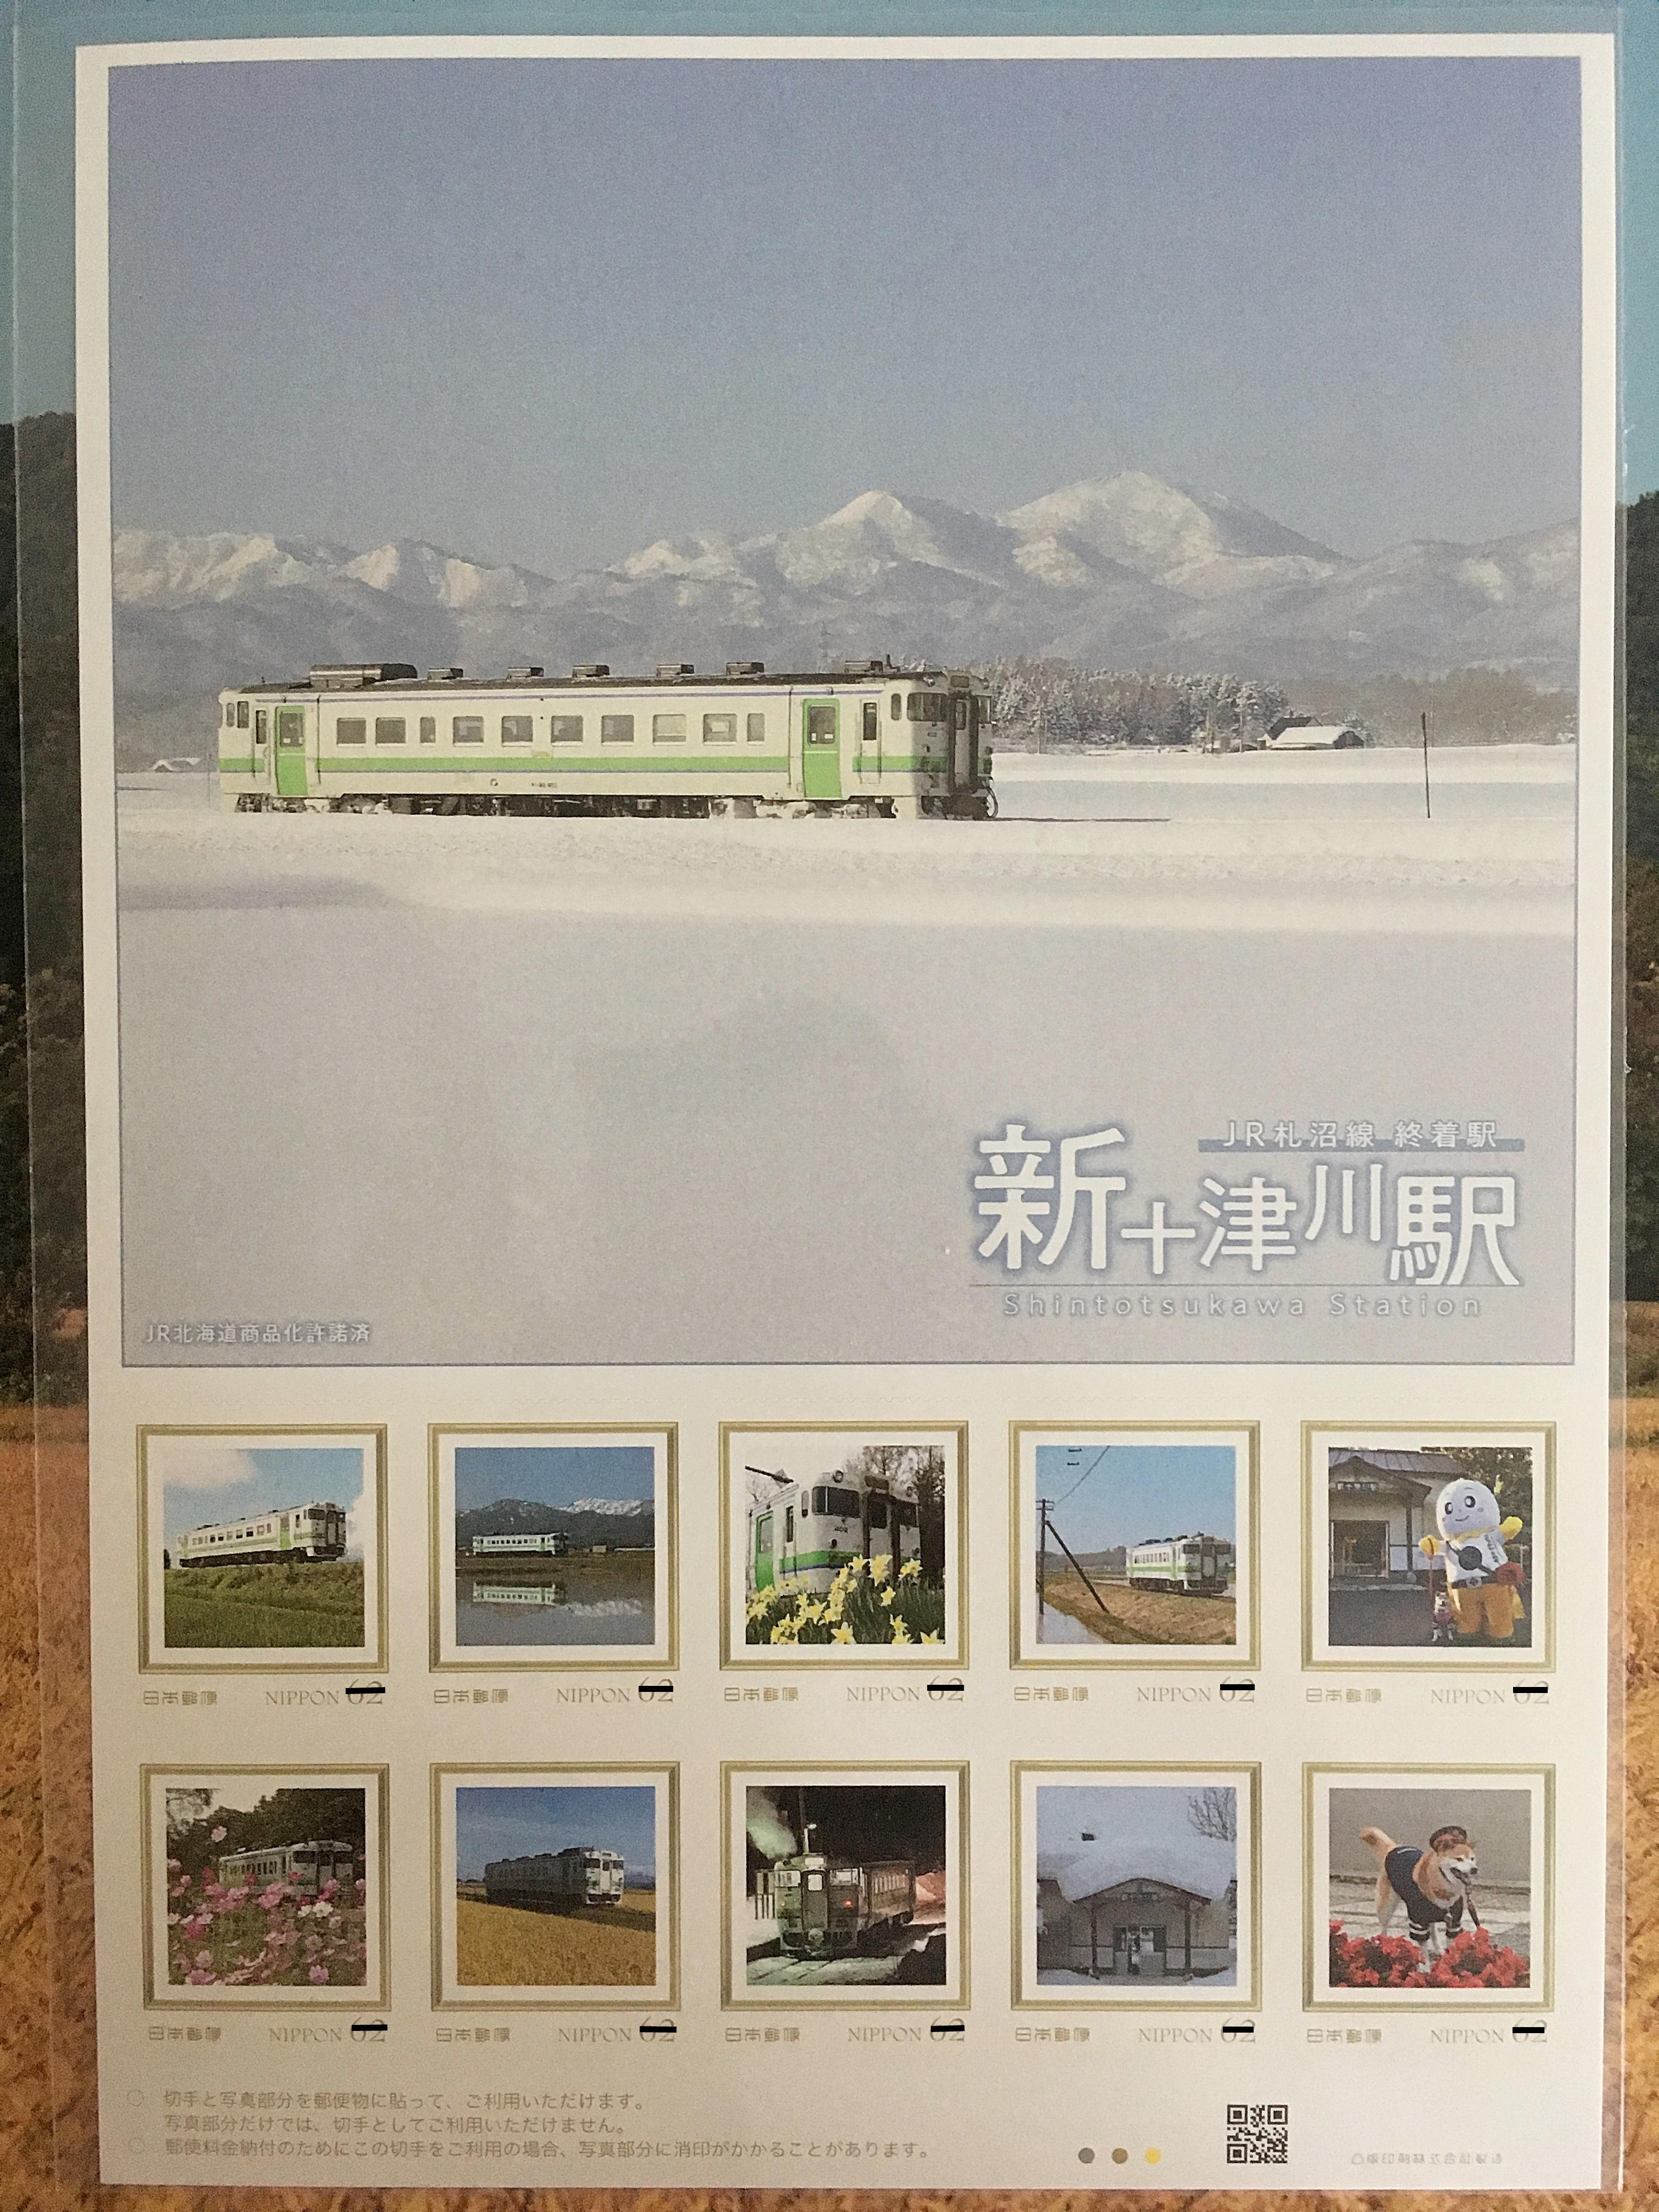 JR札沼線 終着駅 新十津川駅フレーム切手 アップ.JPG